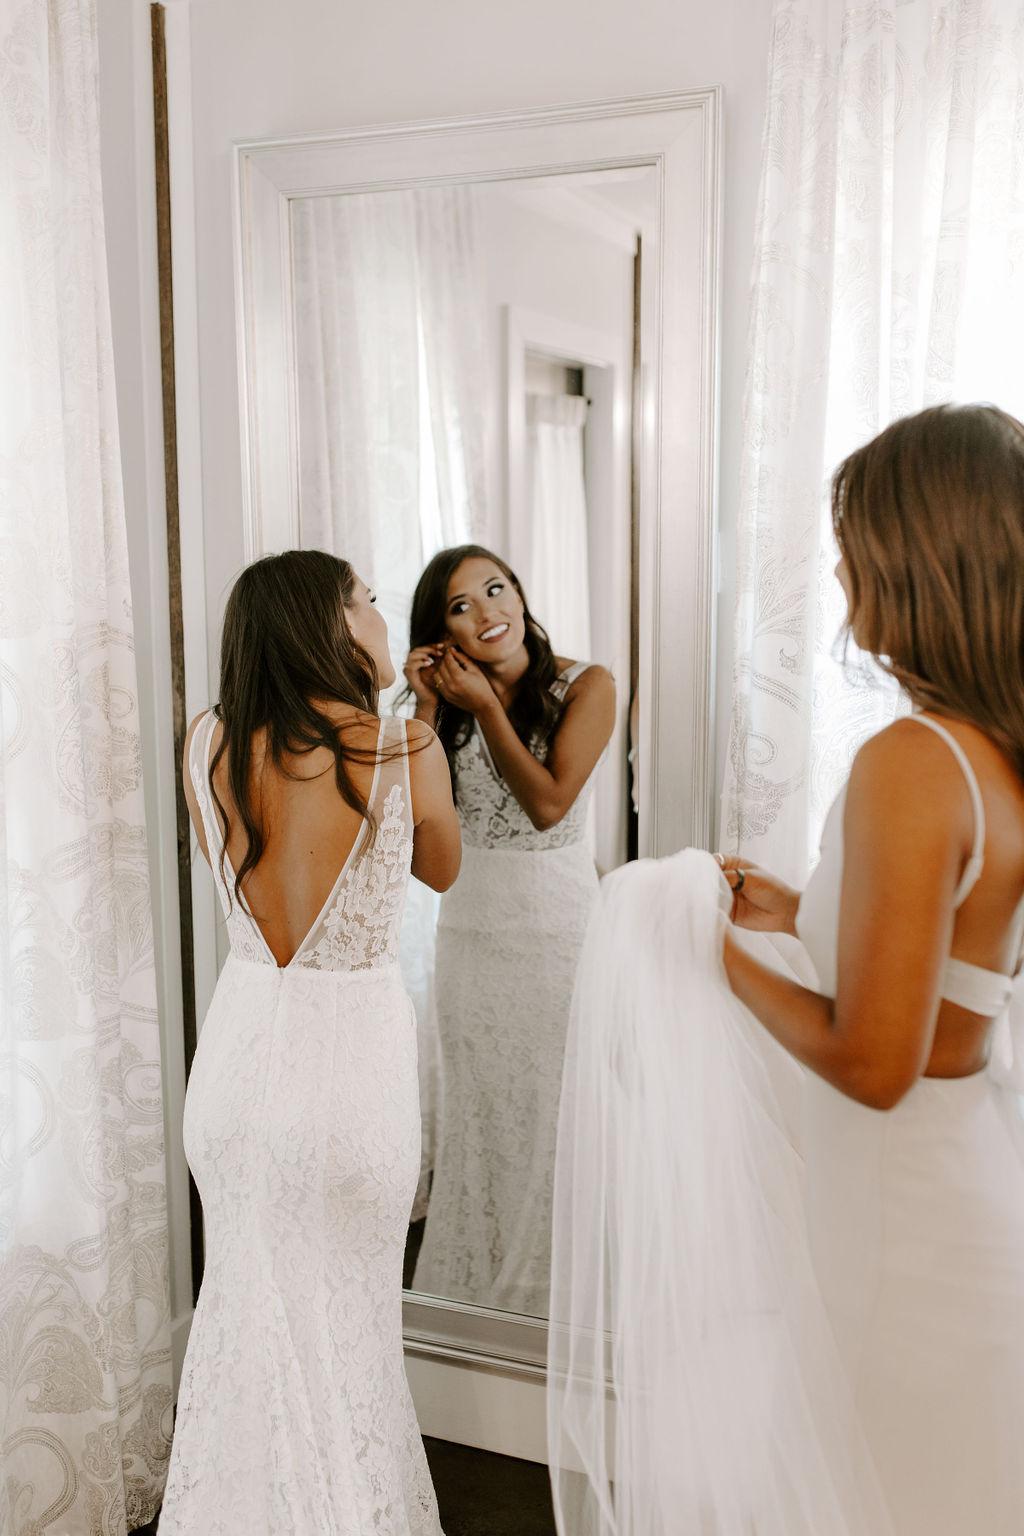 Tulsa White Barn Wedding Venue Outdoor Ceremony 16.jpg